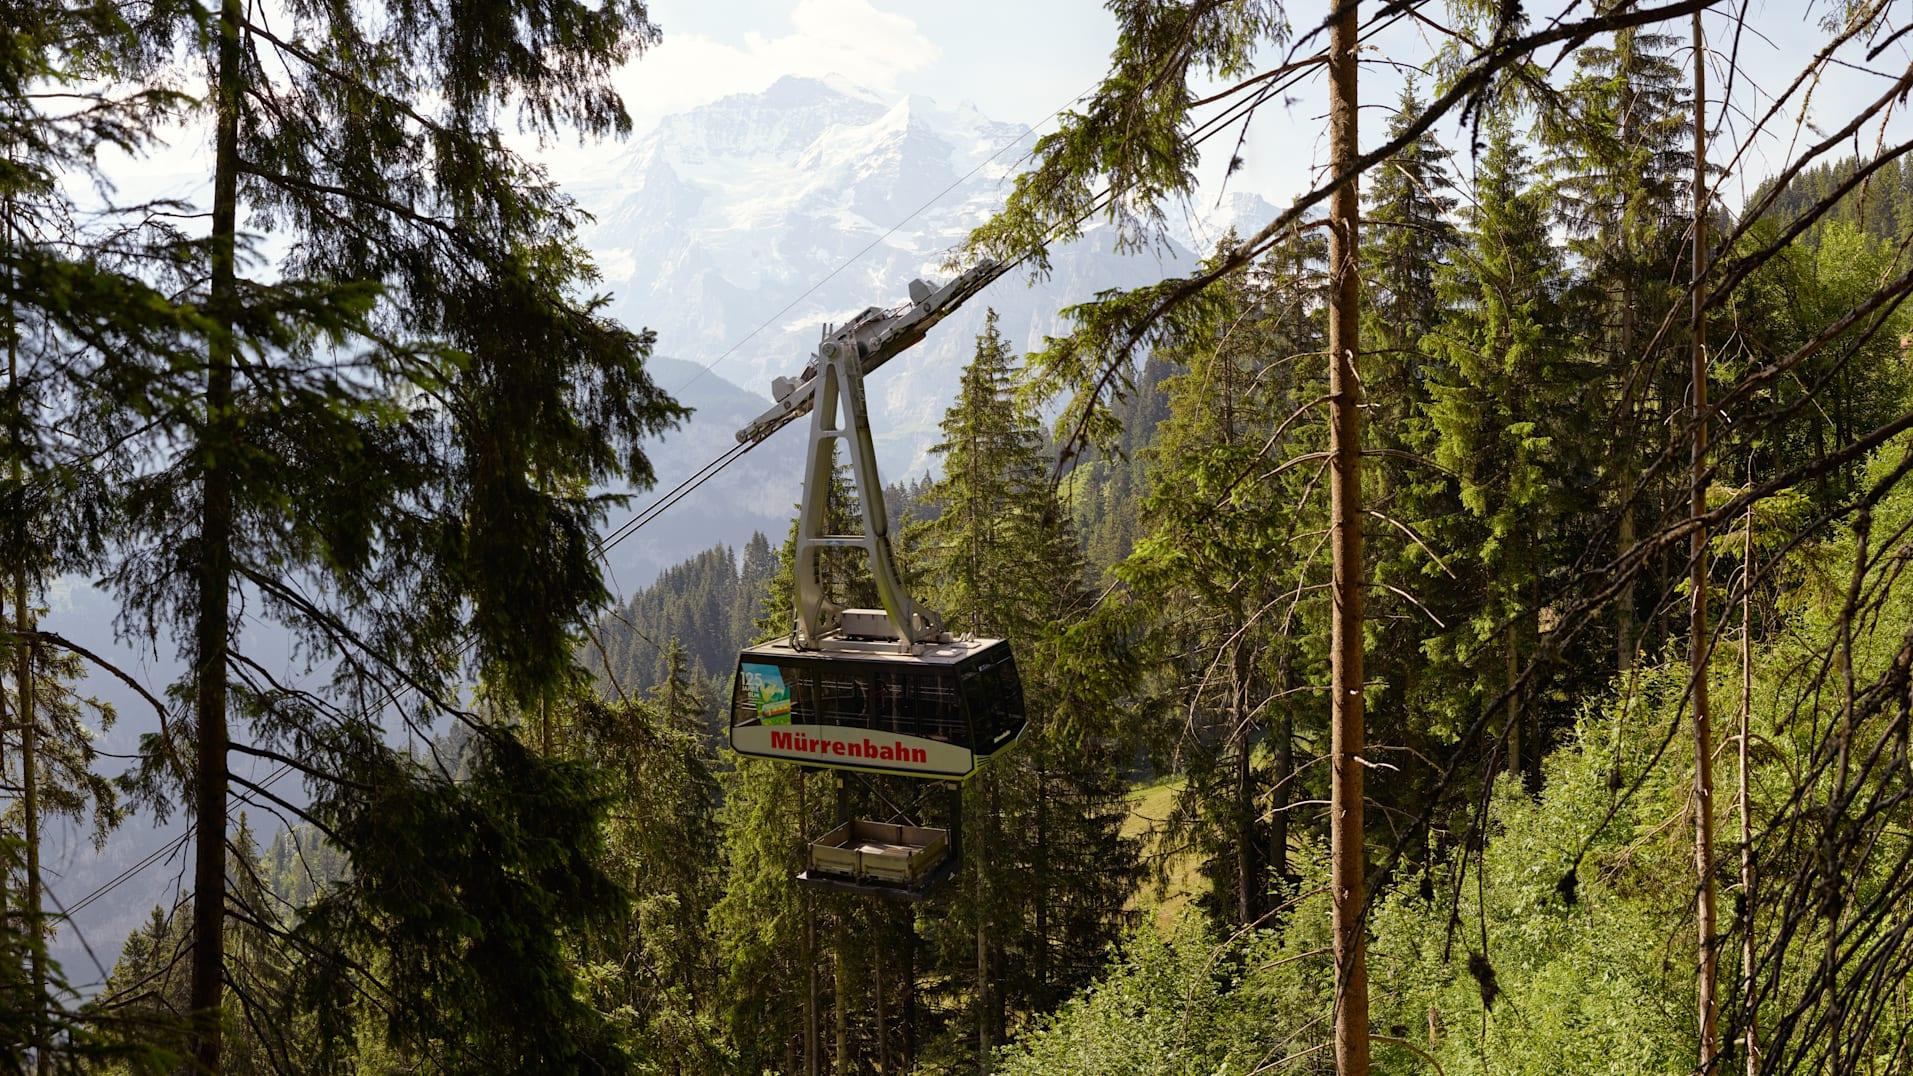 Bergbahn Lauterbrunnen Muerren Sommer Wald